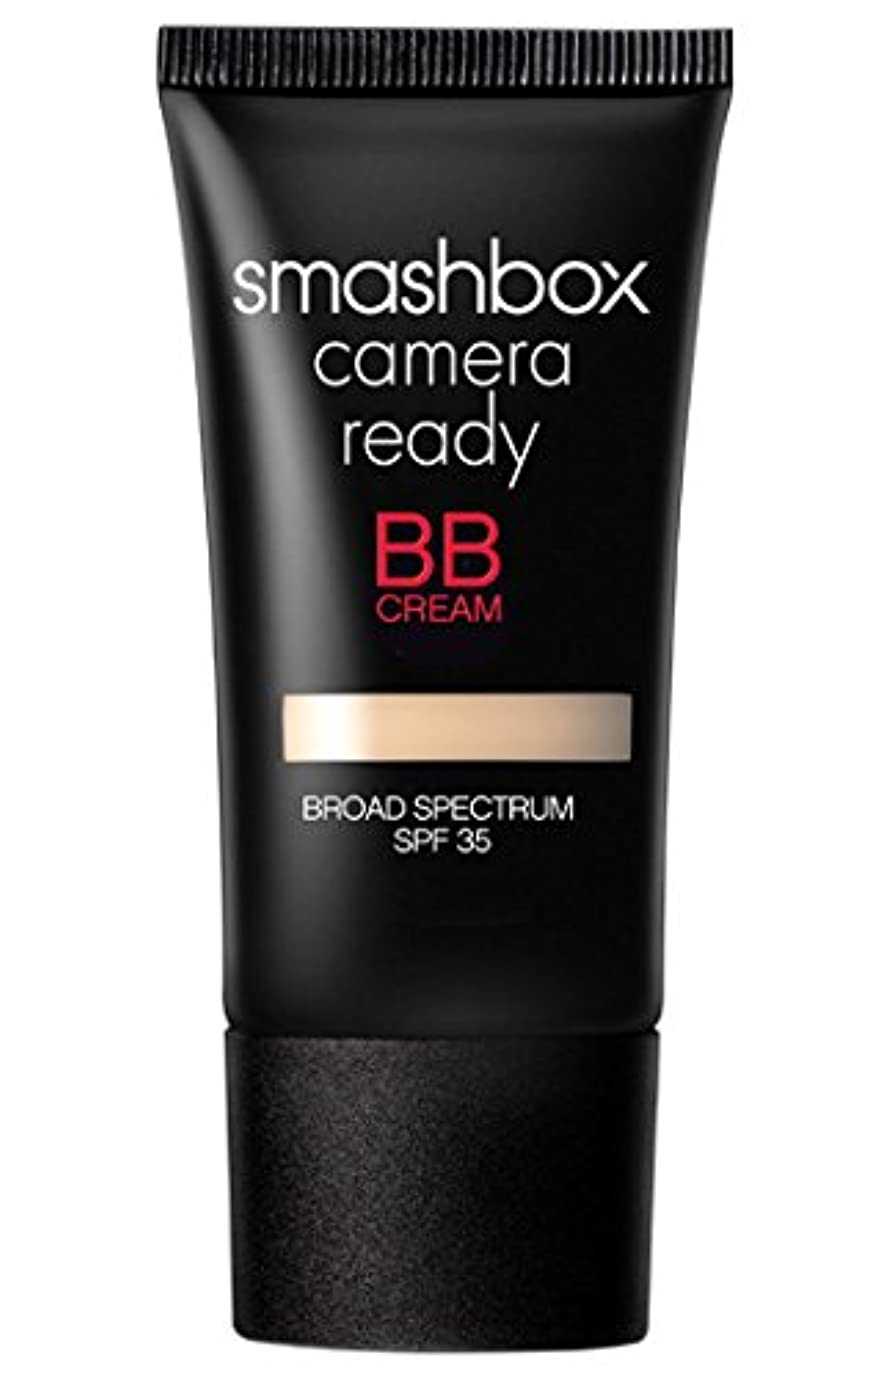 Smashbox スマッシュボックスカメラレディ BB クリーム 30ml [並行輸入品]